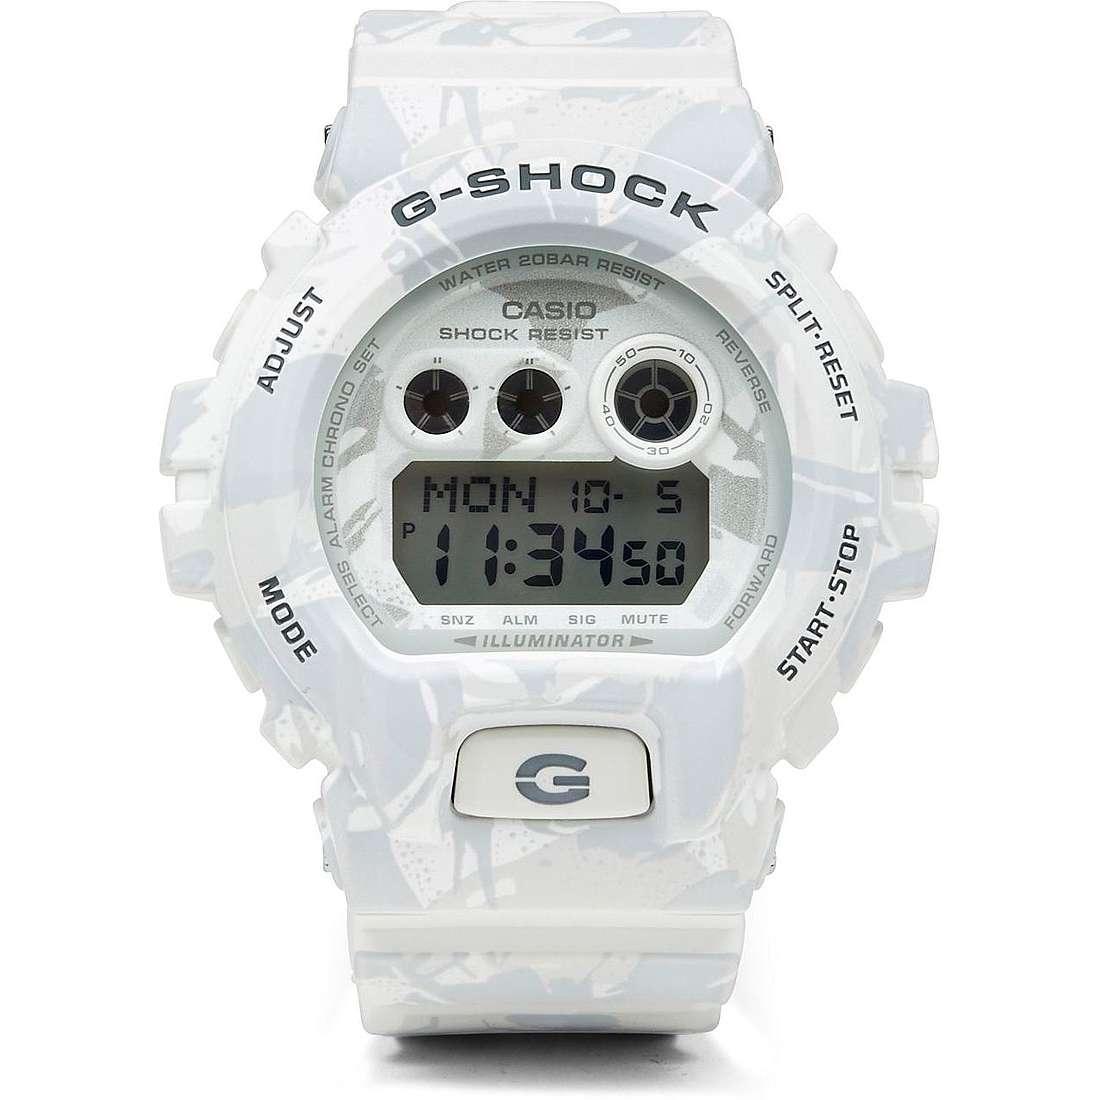 orologio digitale unisex Casio G-SHOCK GD-X6900MC-7ER